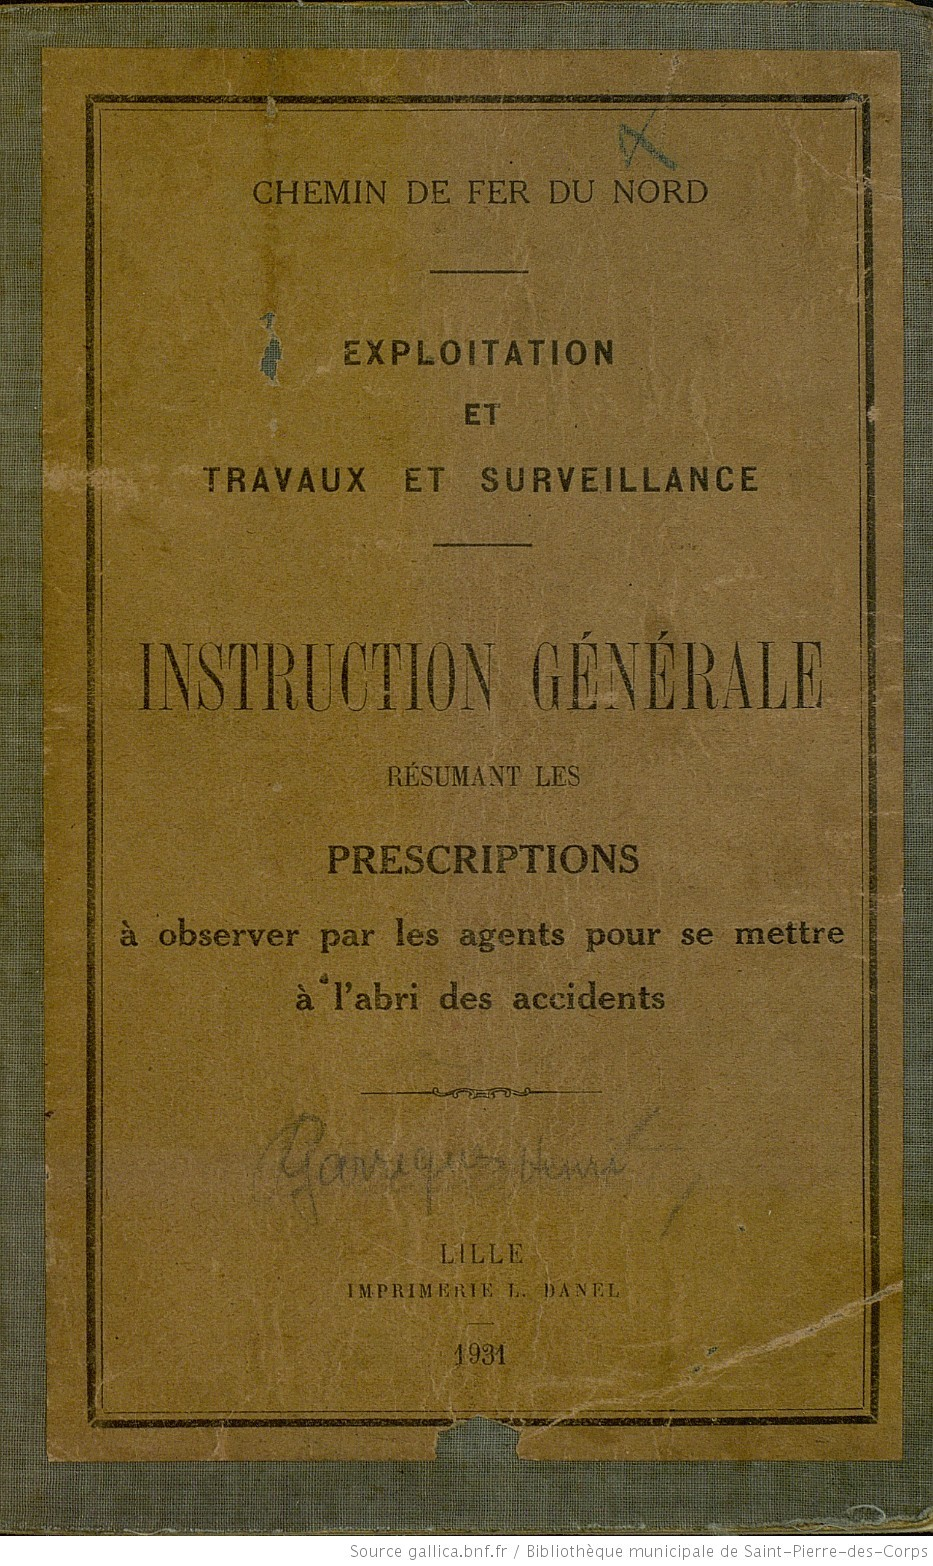 http://gallica.bnf.fr/ark:/12148/bpt6k58139912.thumbnail.highres.jpg